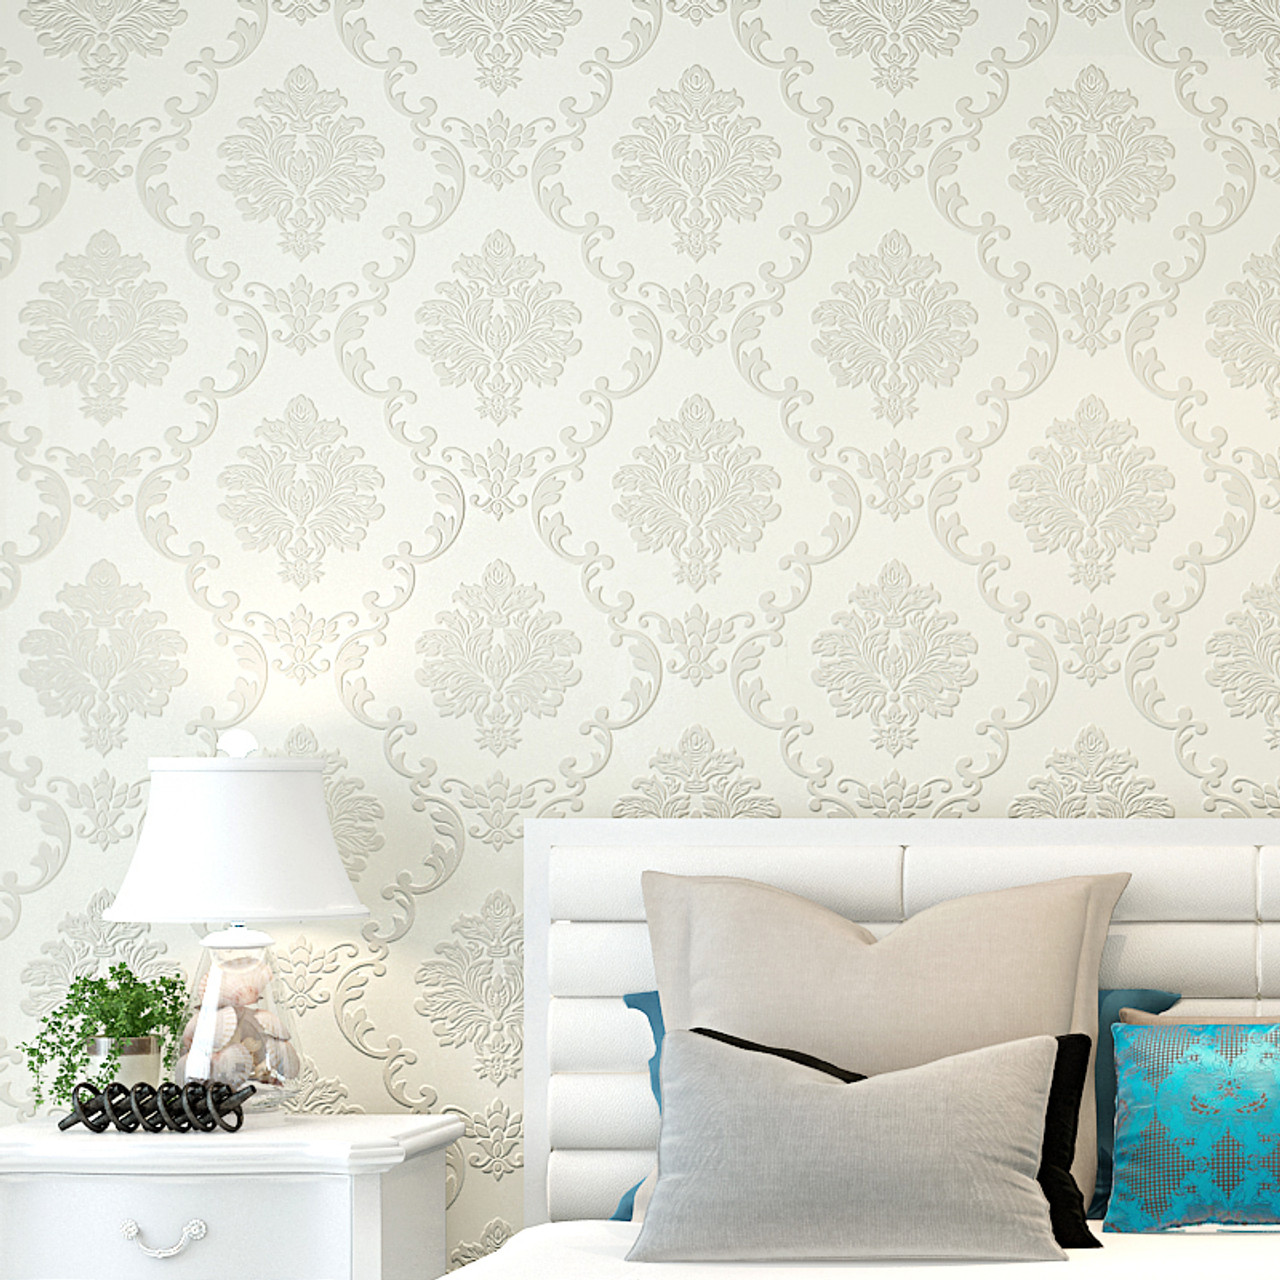 European Style 3d Embossed Floral Luxury Damask Wallpaper